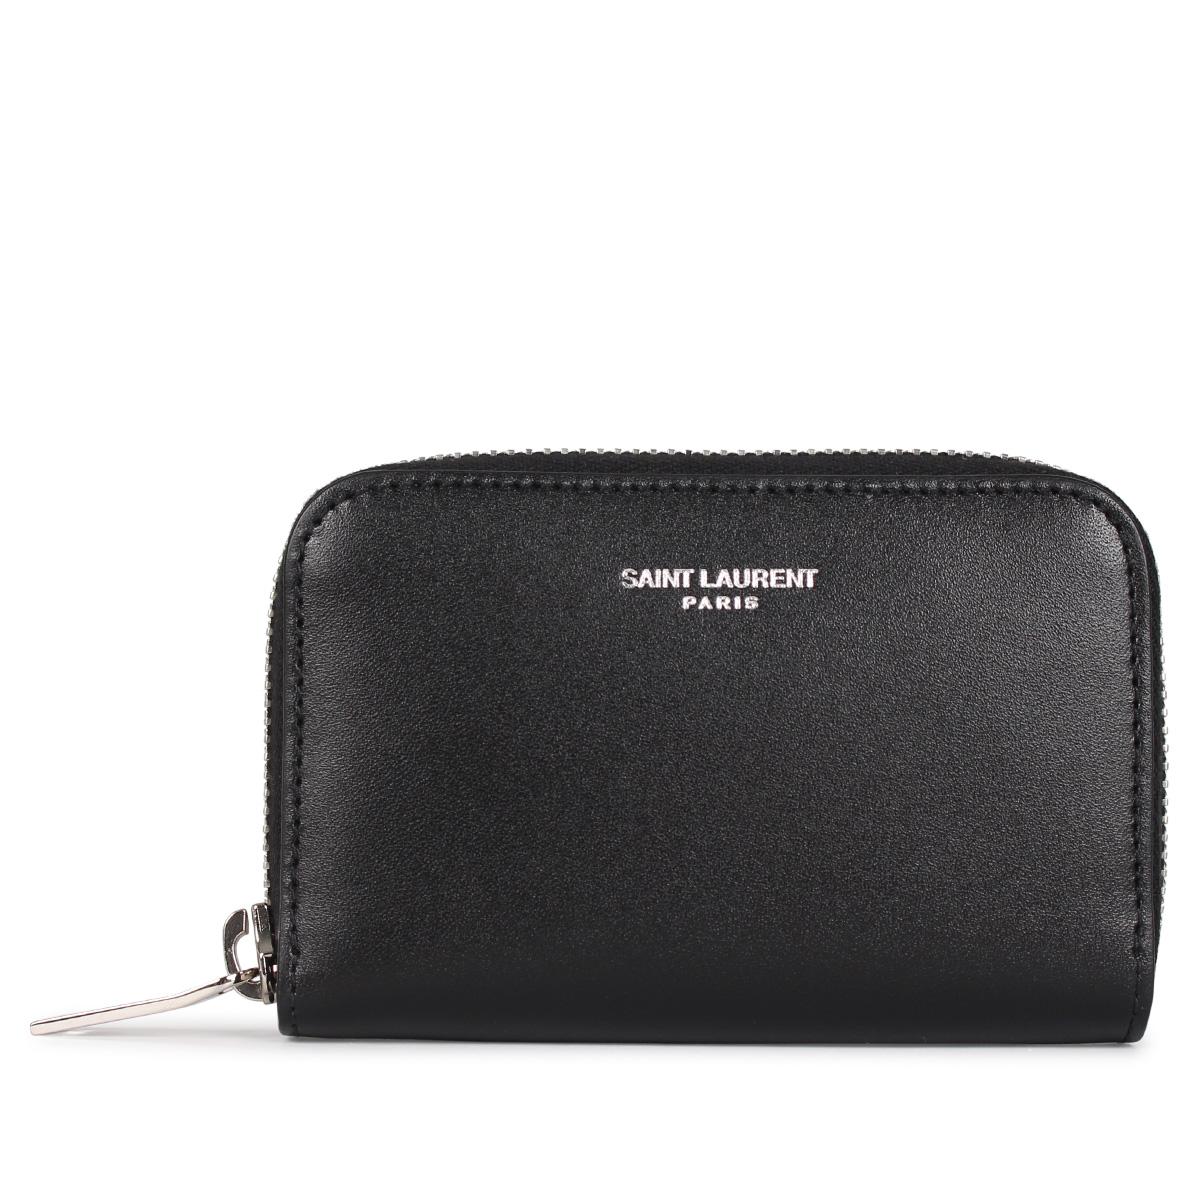 SAINT LAURENT PARIS COIN CASE サンローラン パリ 財布 コインケース 小銭入れ メンズ ブラック 黒 5065220U90N